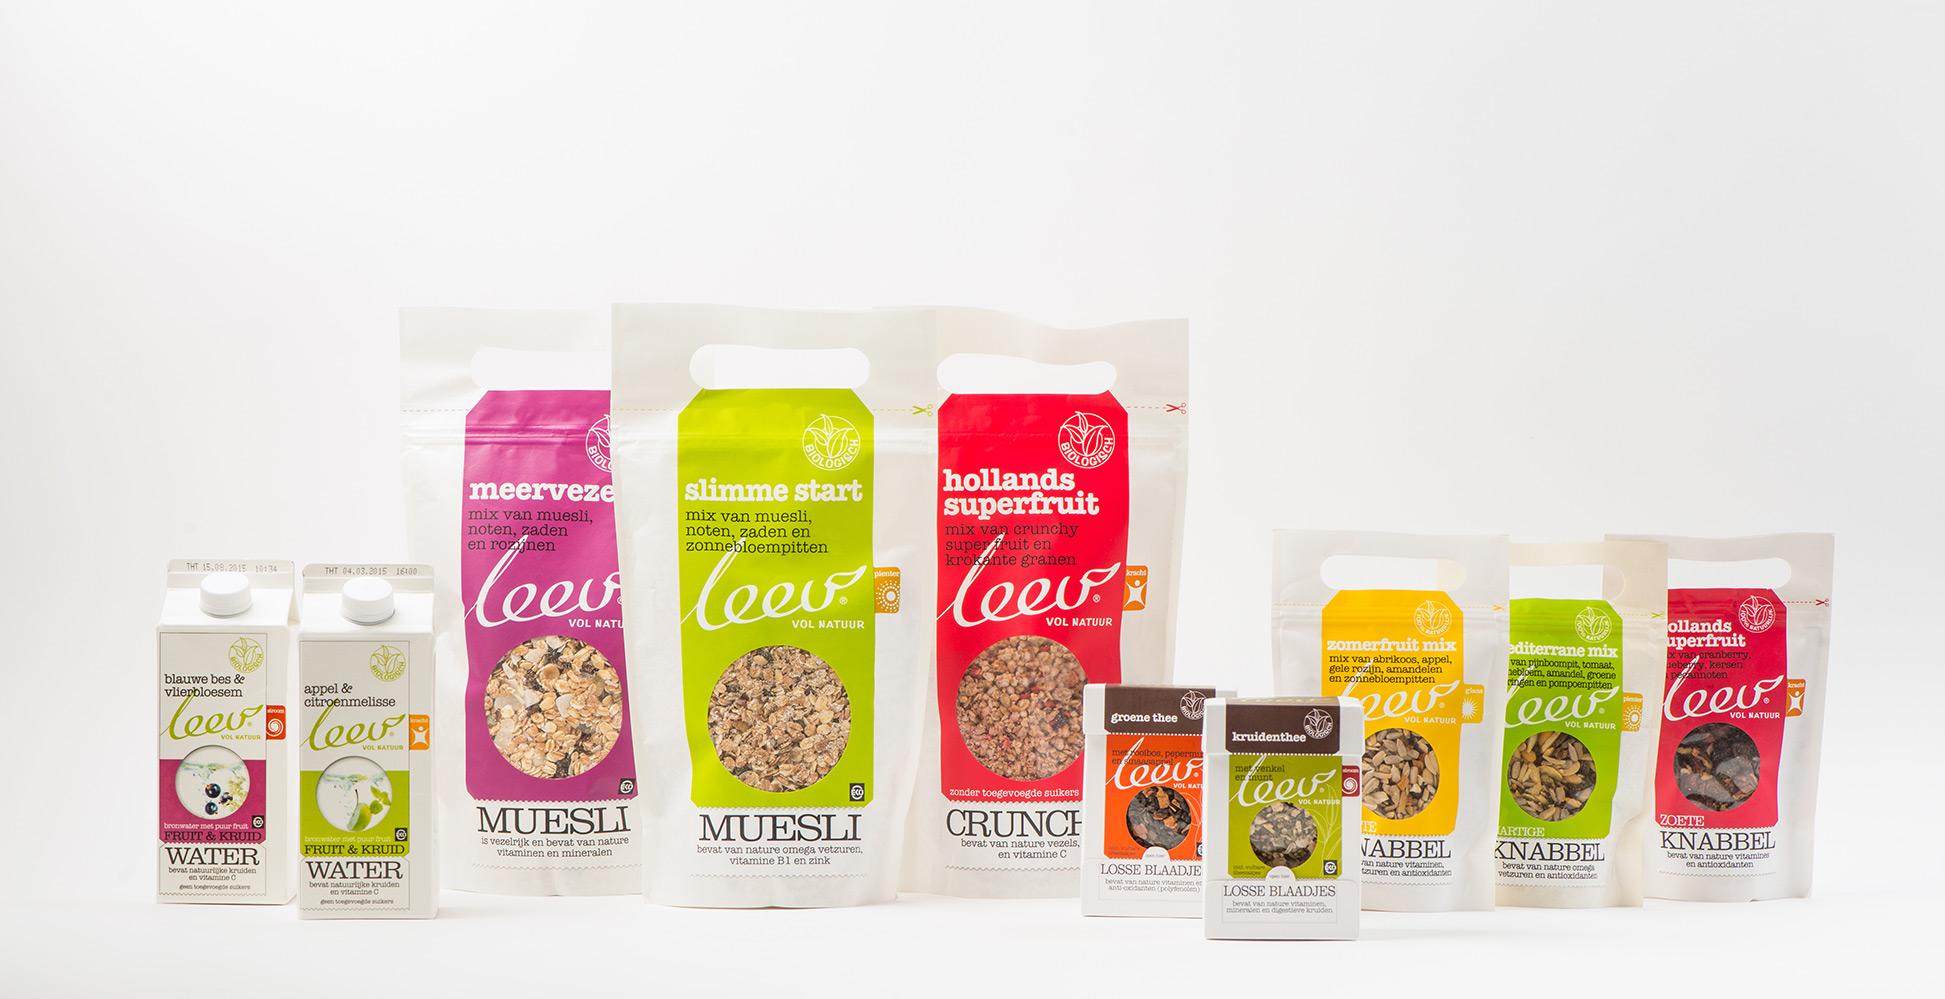 innovation-healthy-food-brand-leev